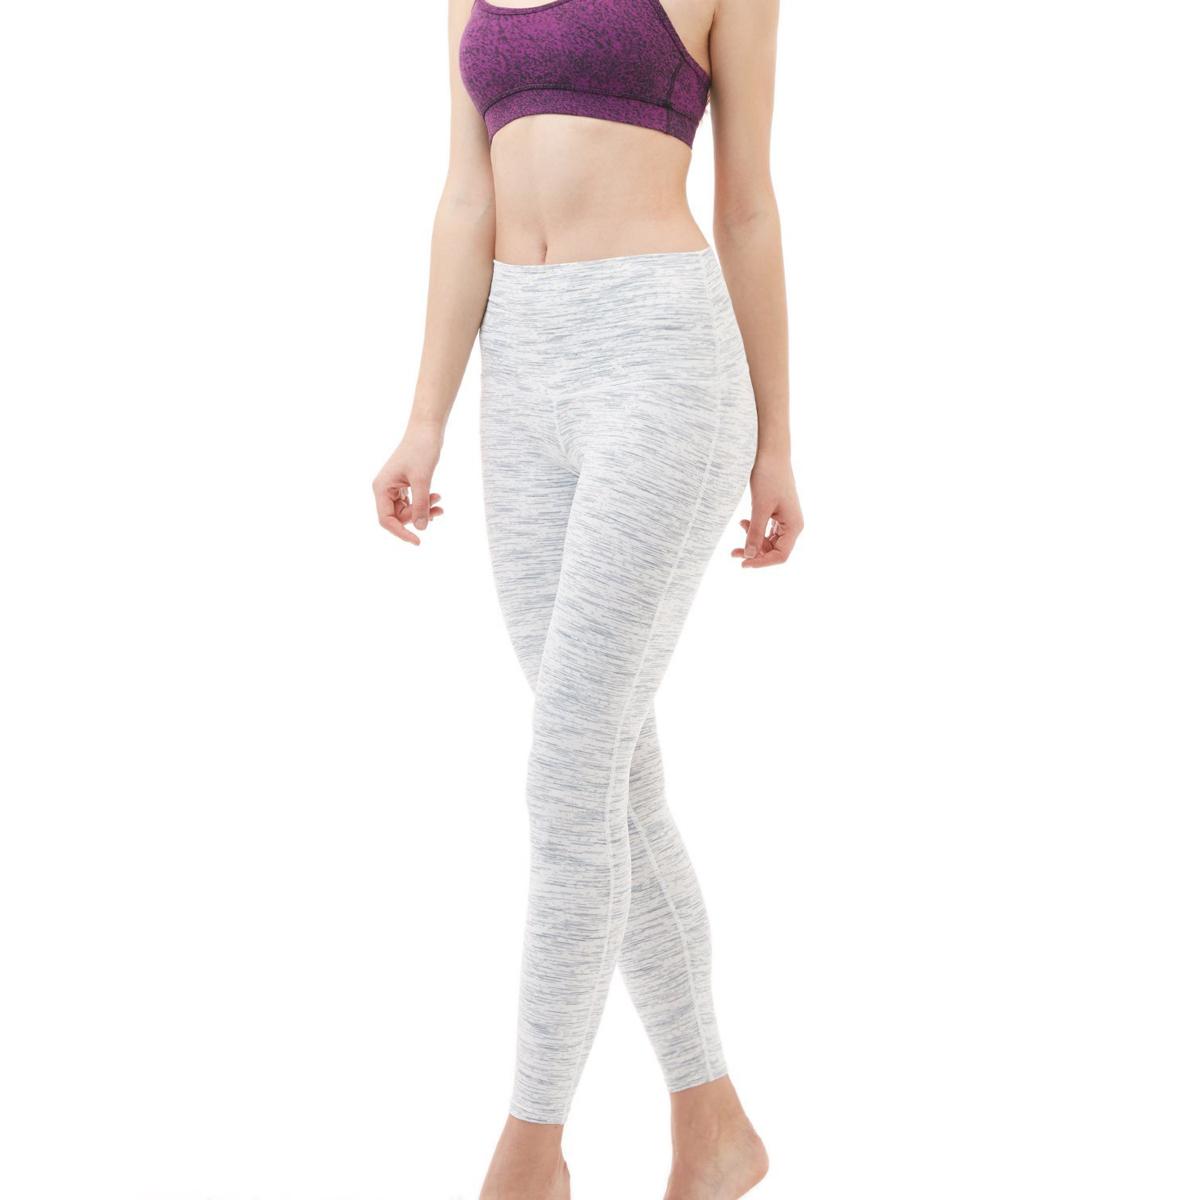 thumbnail 102 - TSLA Tesla FYP42 Women's High-Waisted Ultra-Stretch Tummy Control Yoga Pants